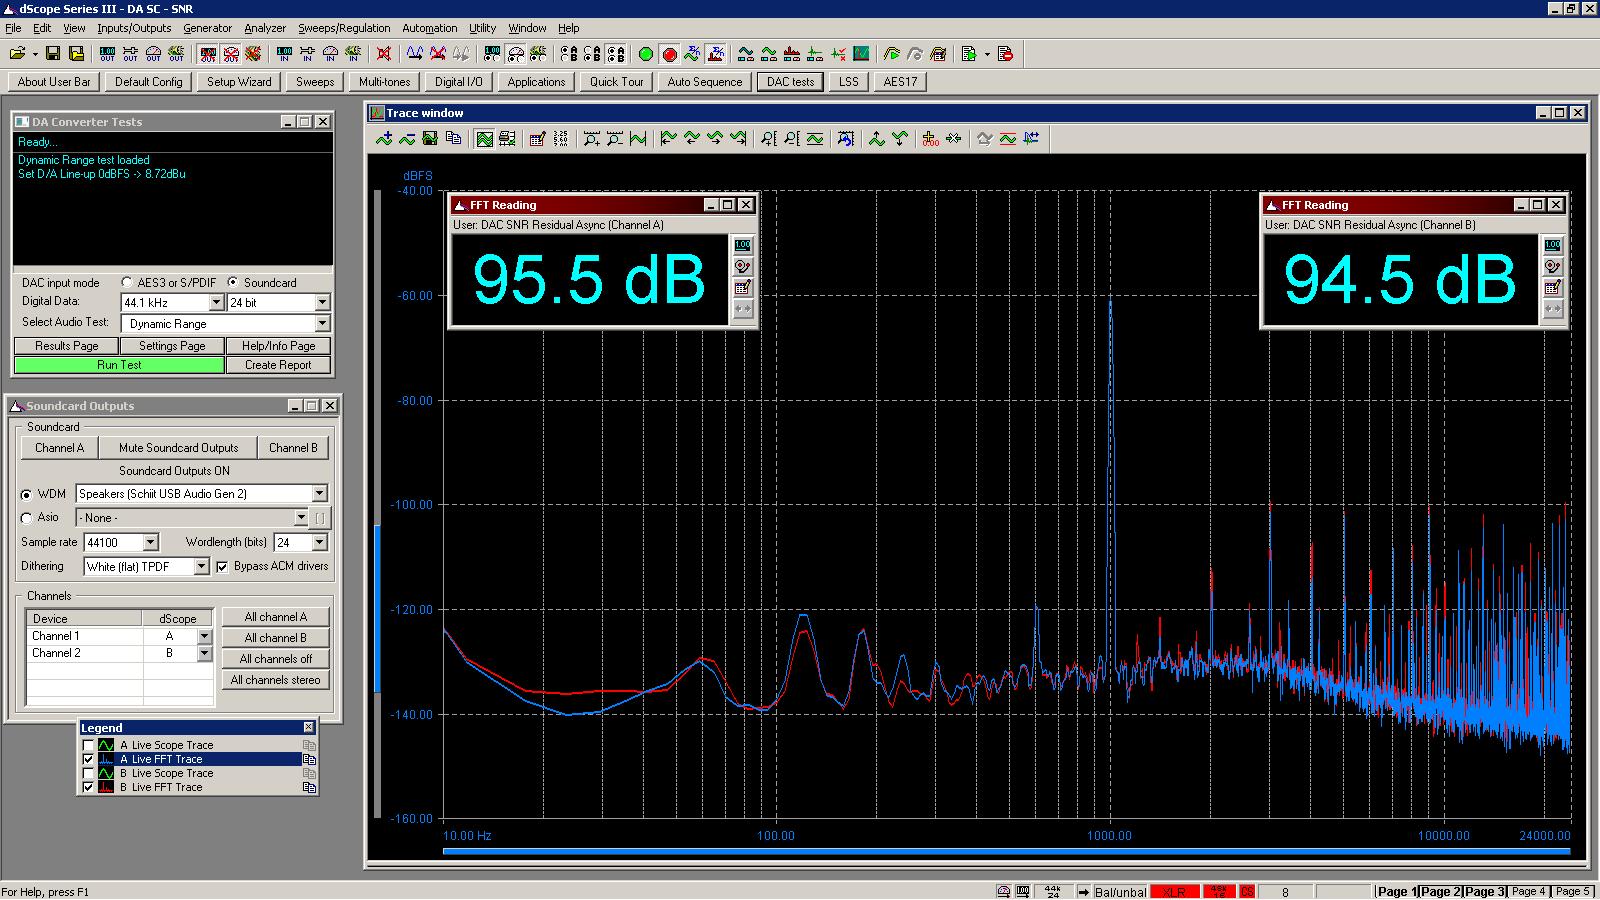 20151120 Bifrost MB SE dynamic range - USB.PNG